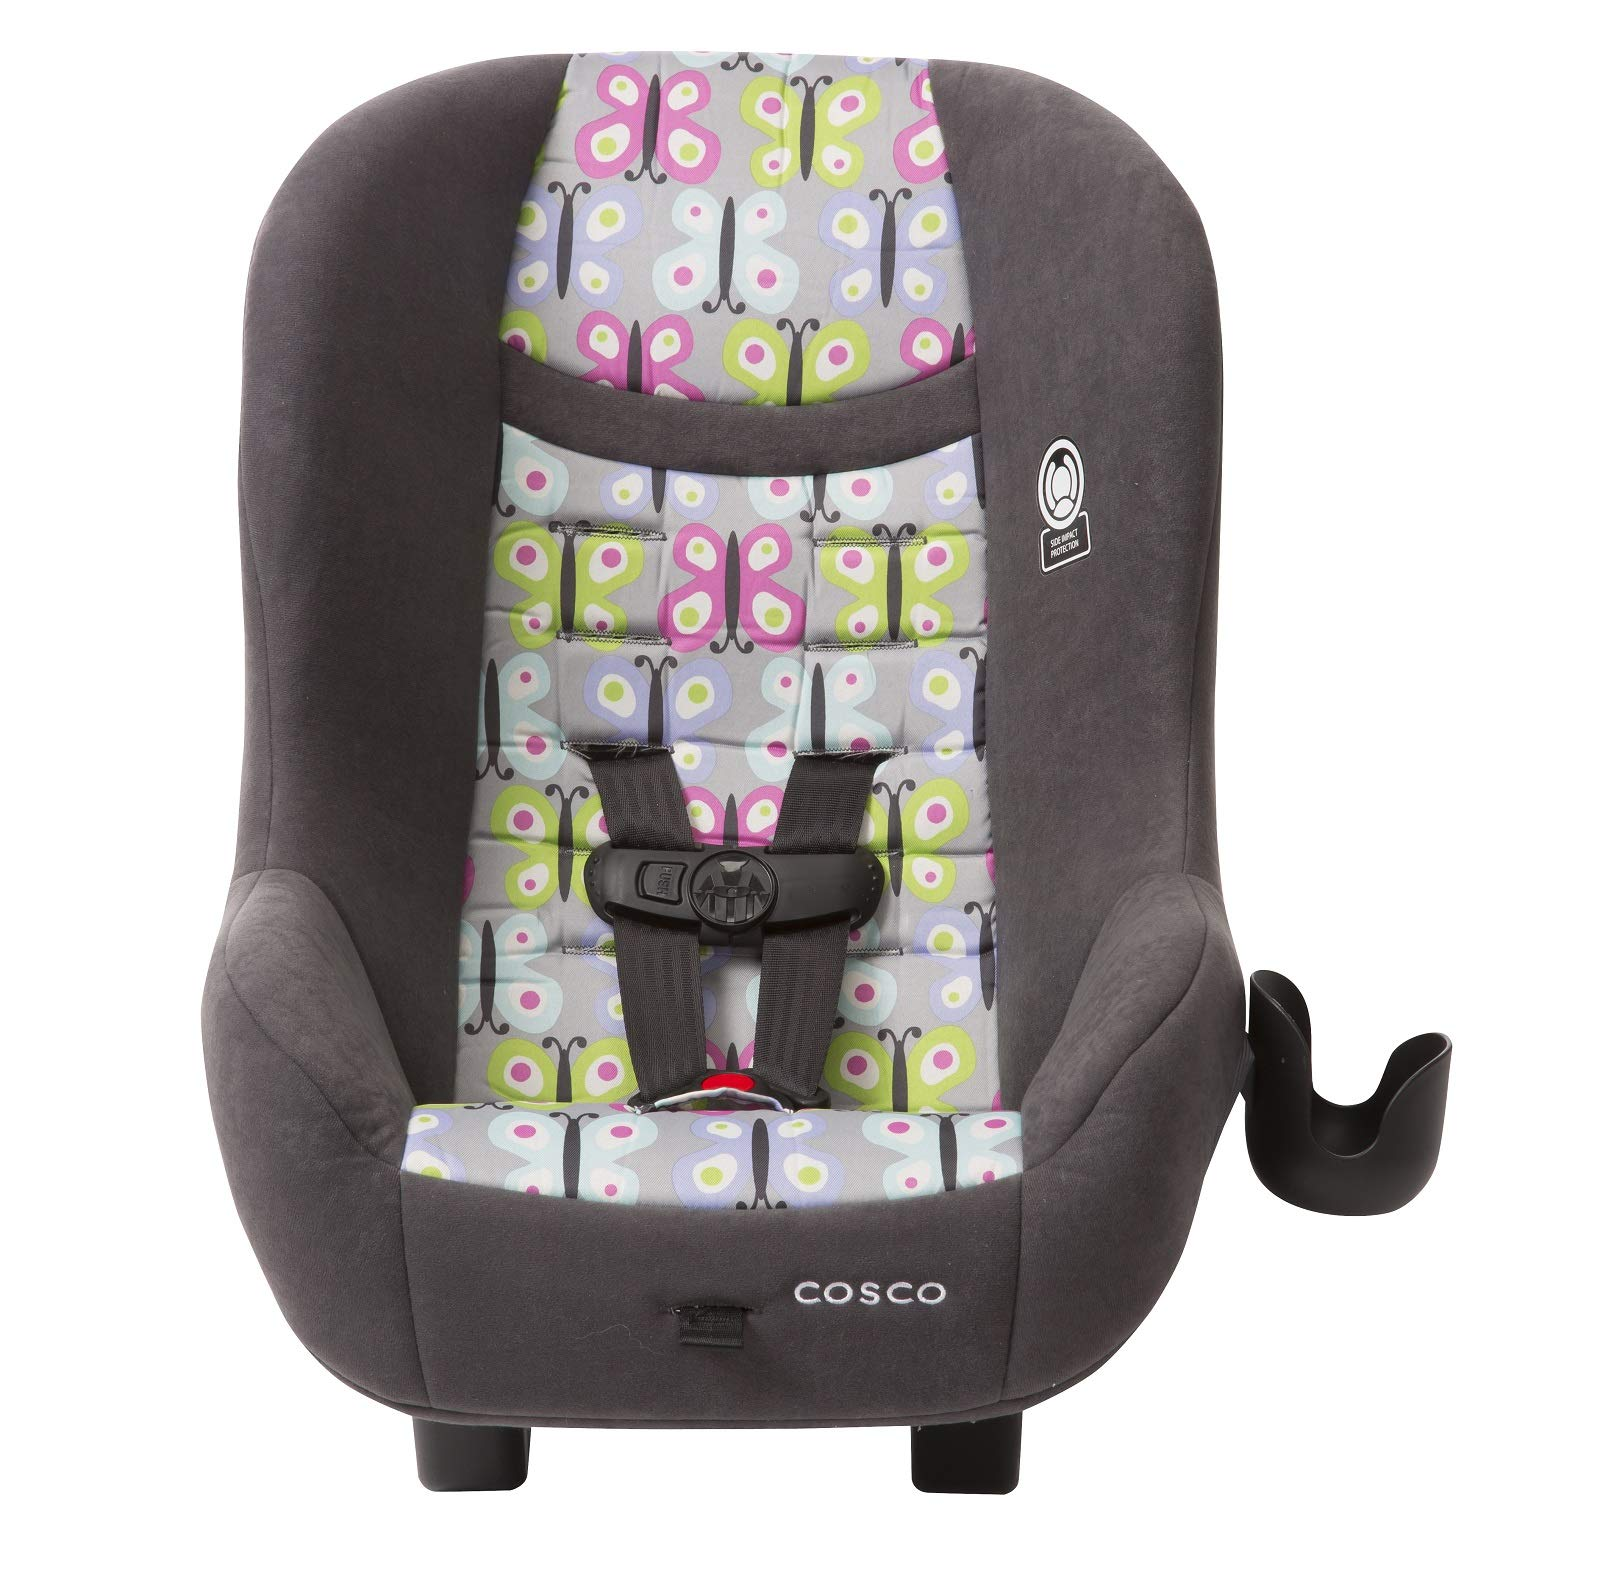 Amazon.com : Safe Cosco Convertible Car Seat Scenera NEXT